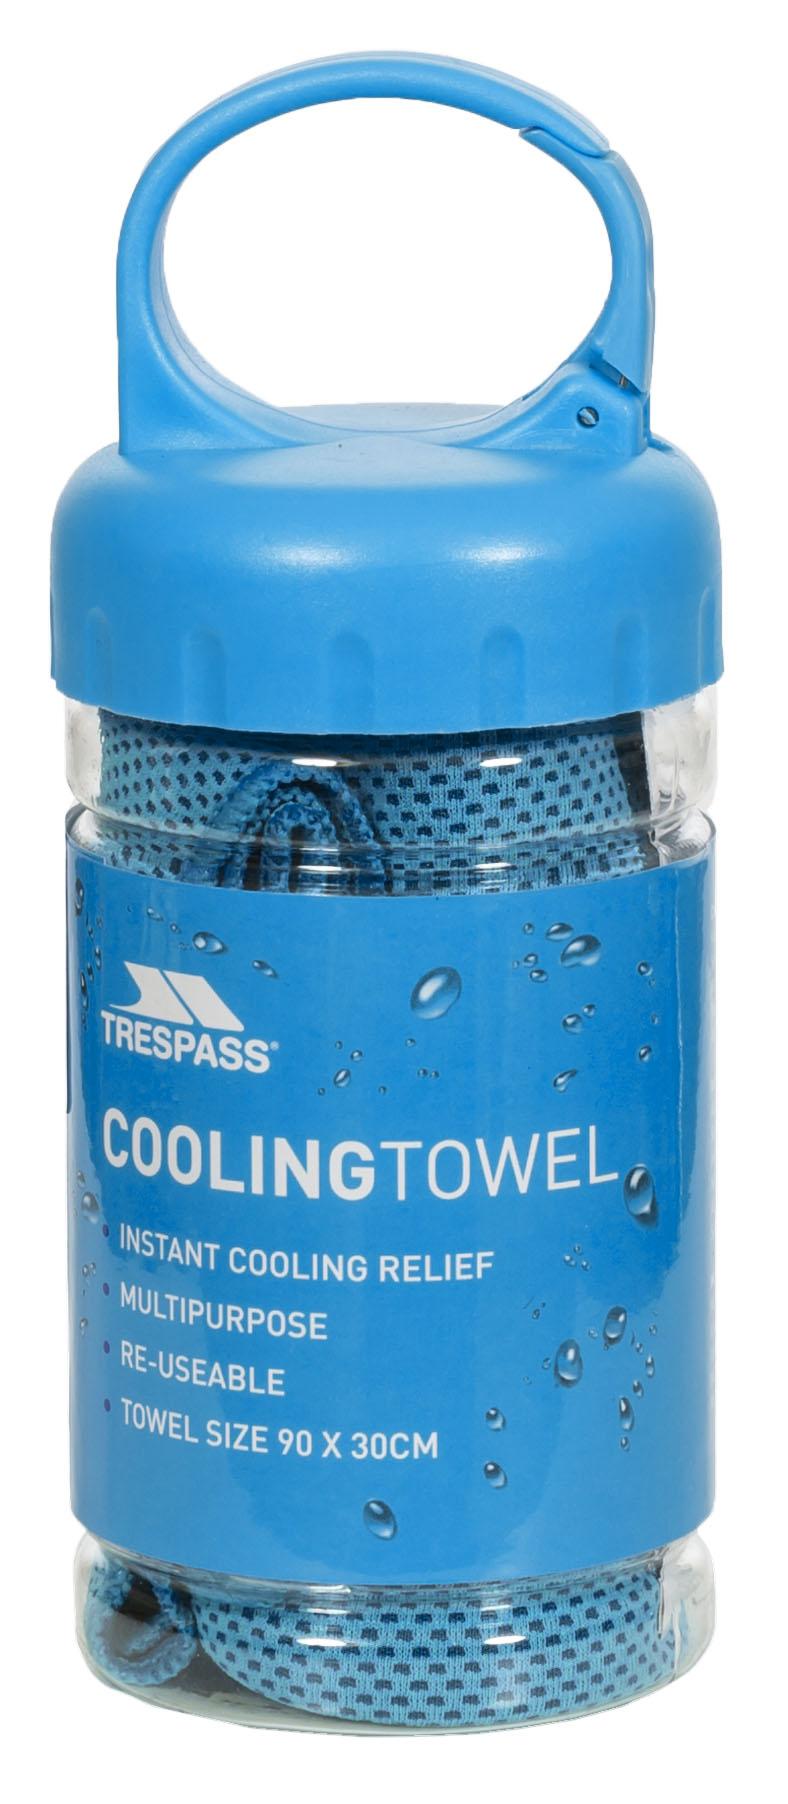 COOLINI kølende håndklæde fra Trespass blå